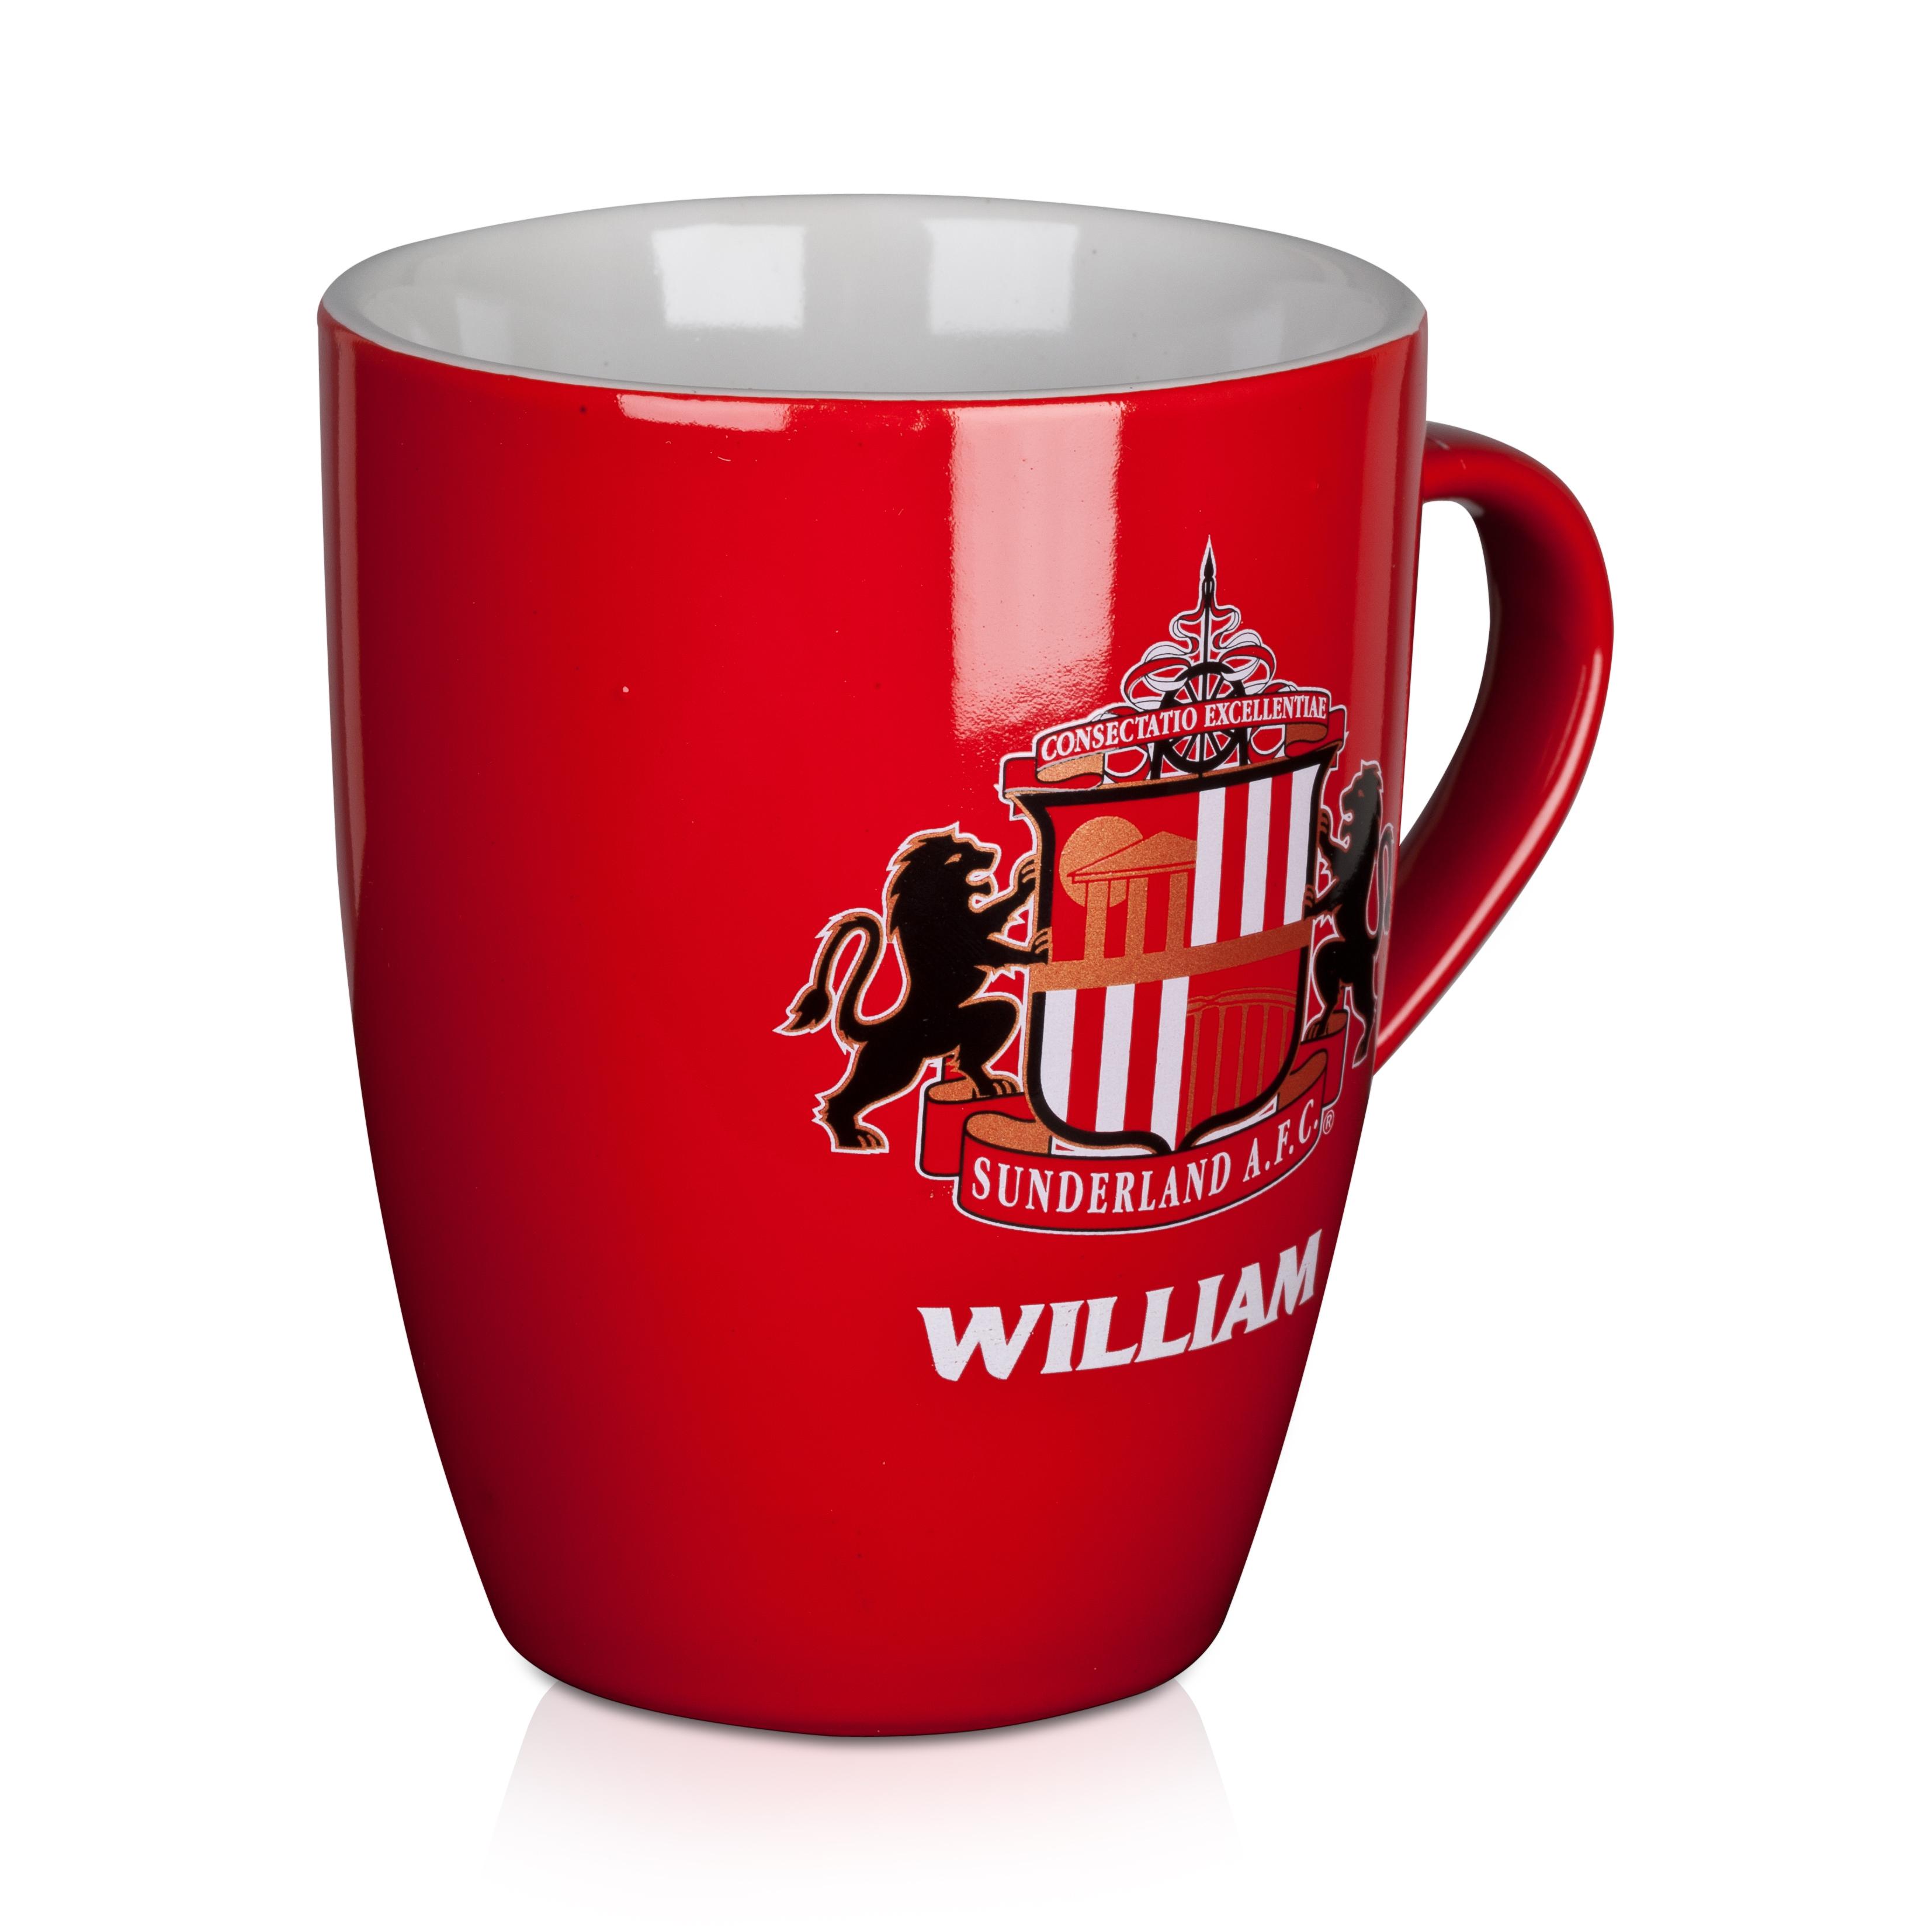 Sunderland Personalised Mug